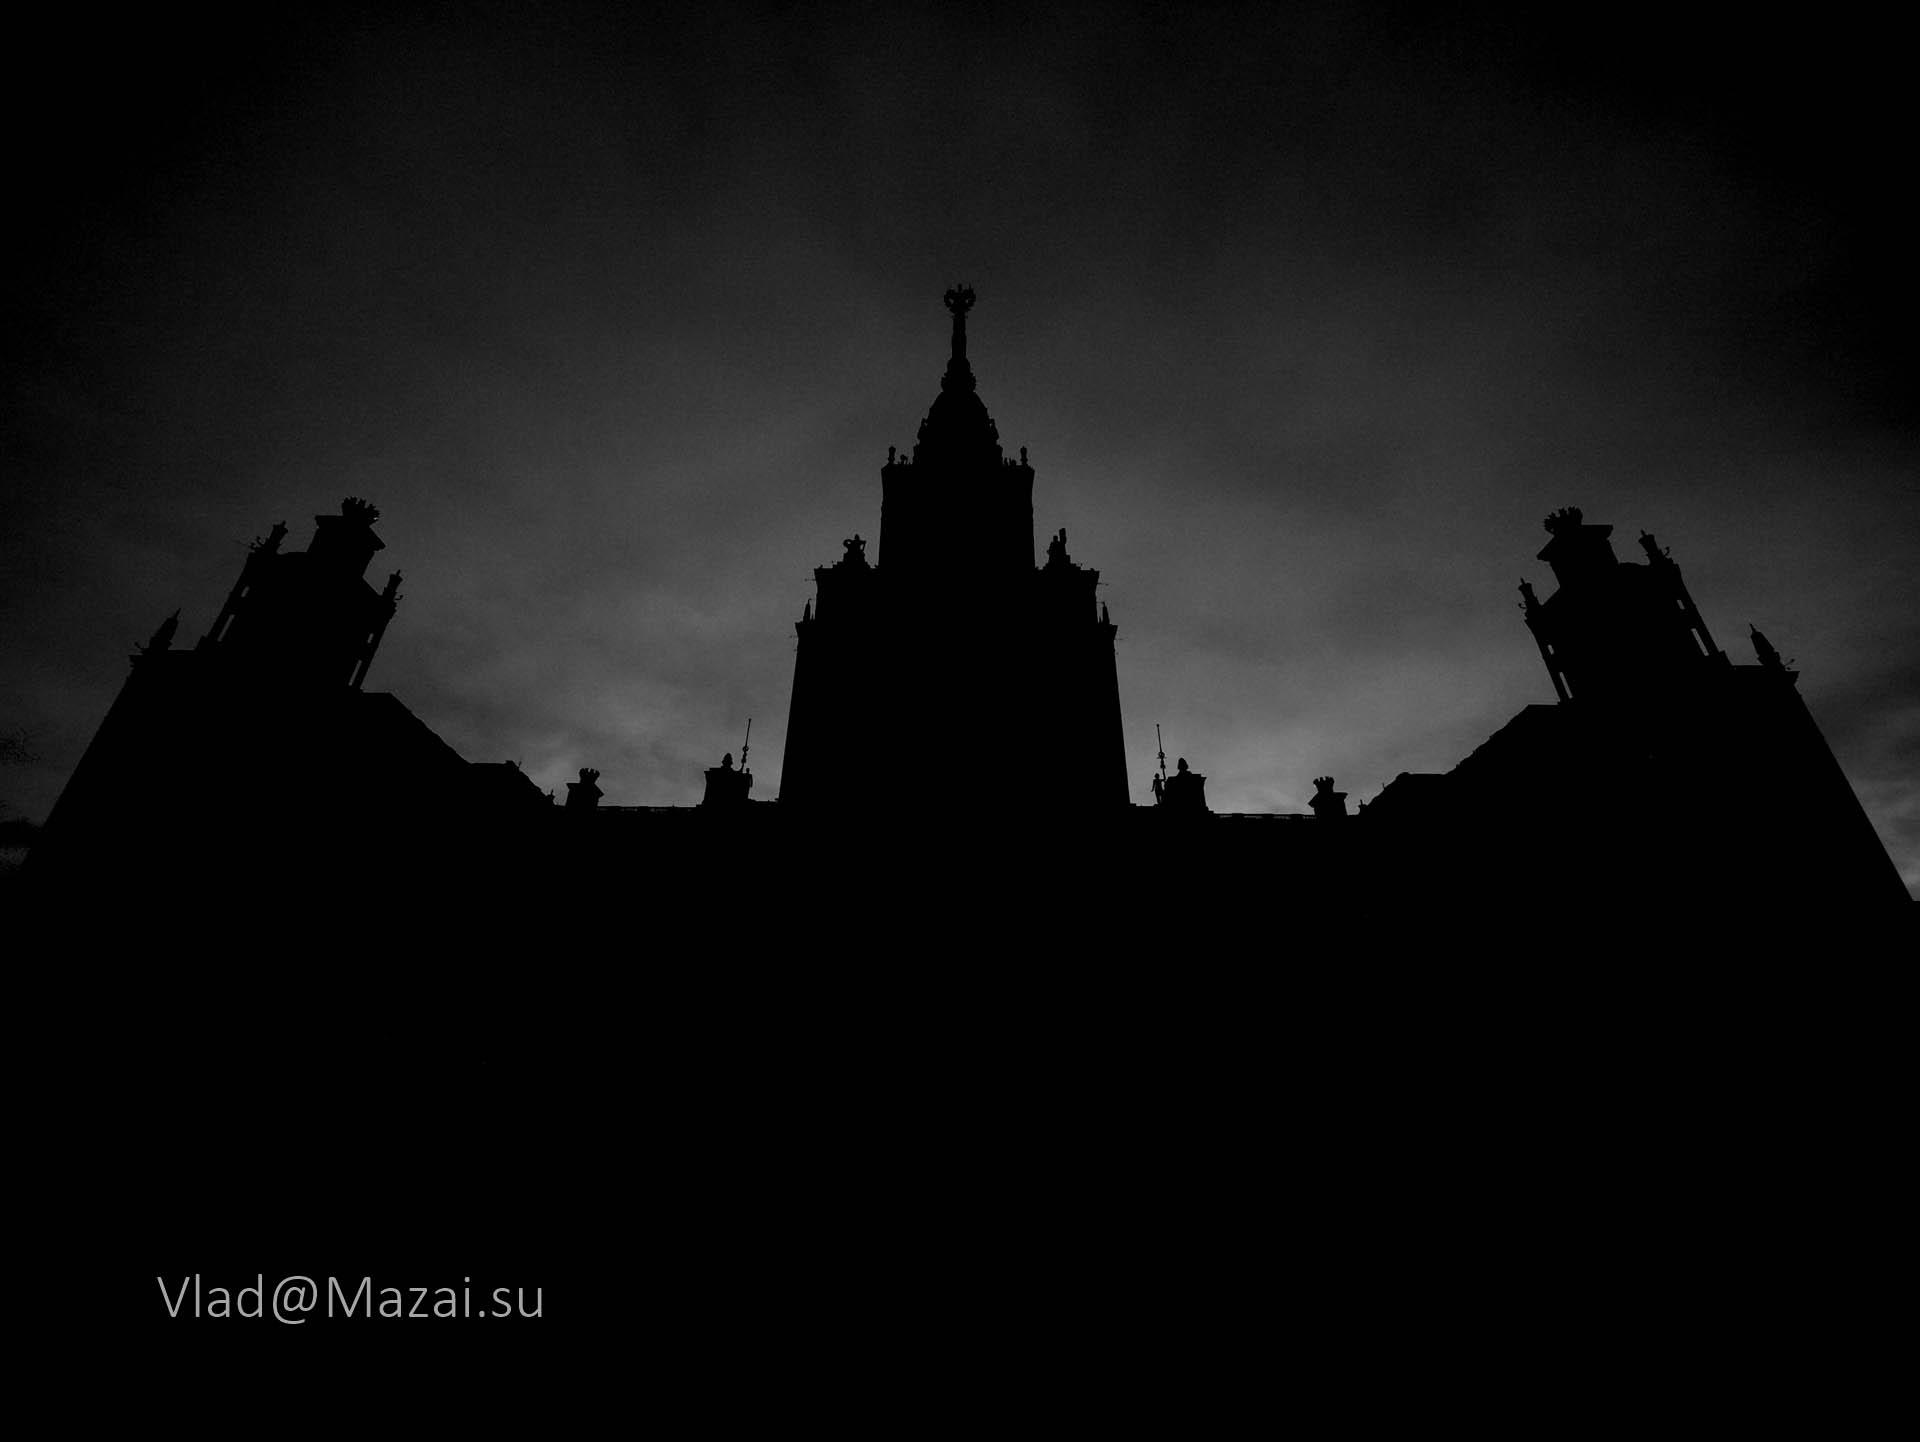 2009-02-02_Moscow_001_E3020924_G_crop.jpg